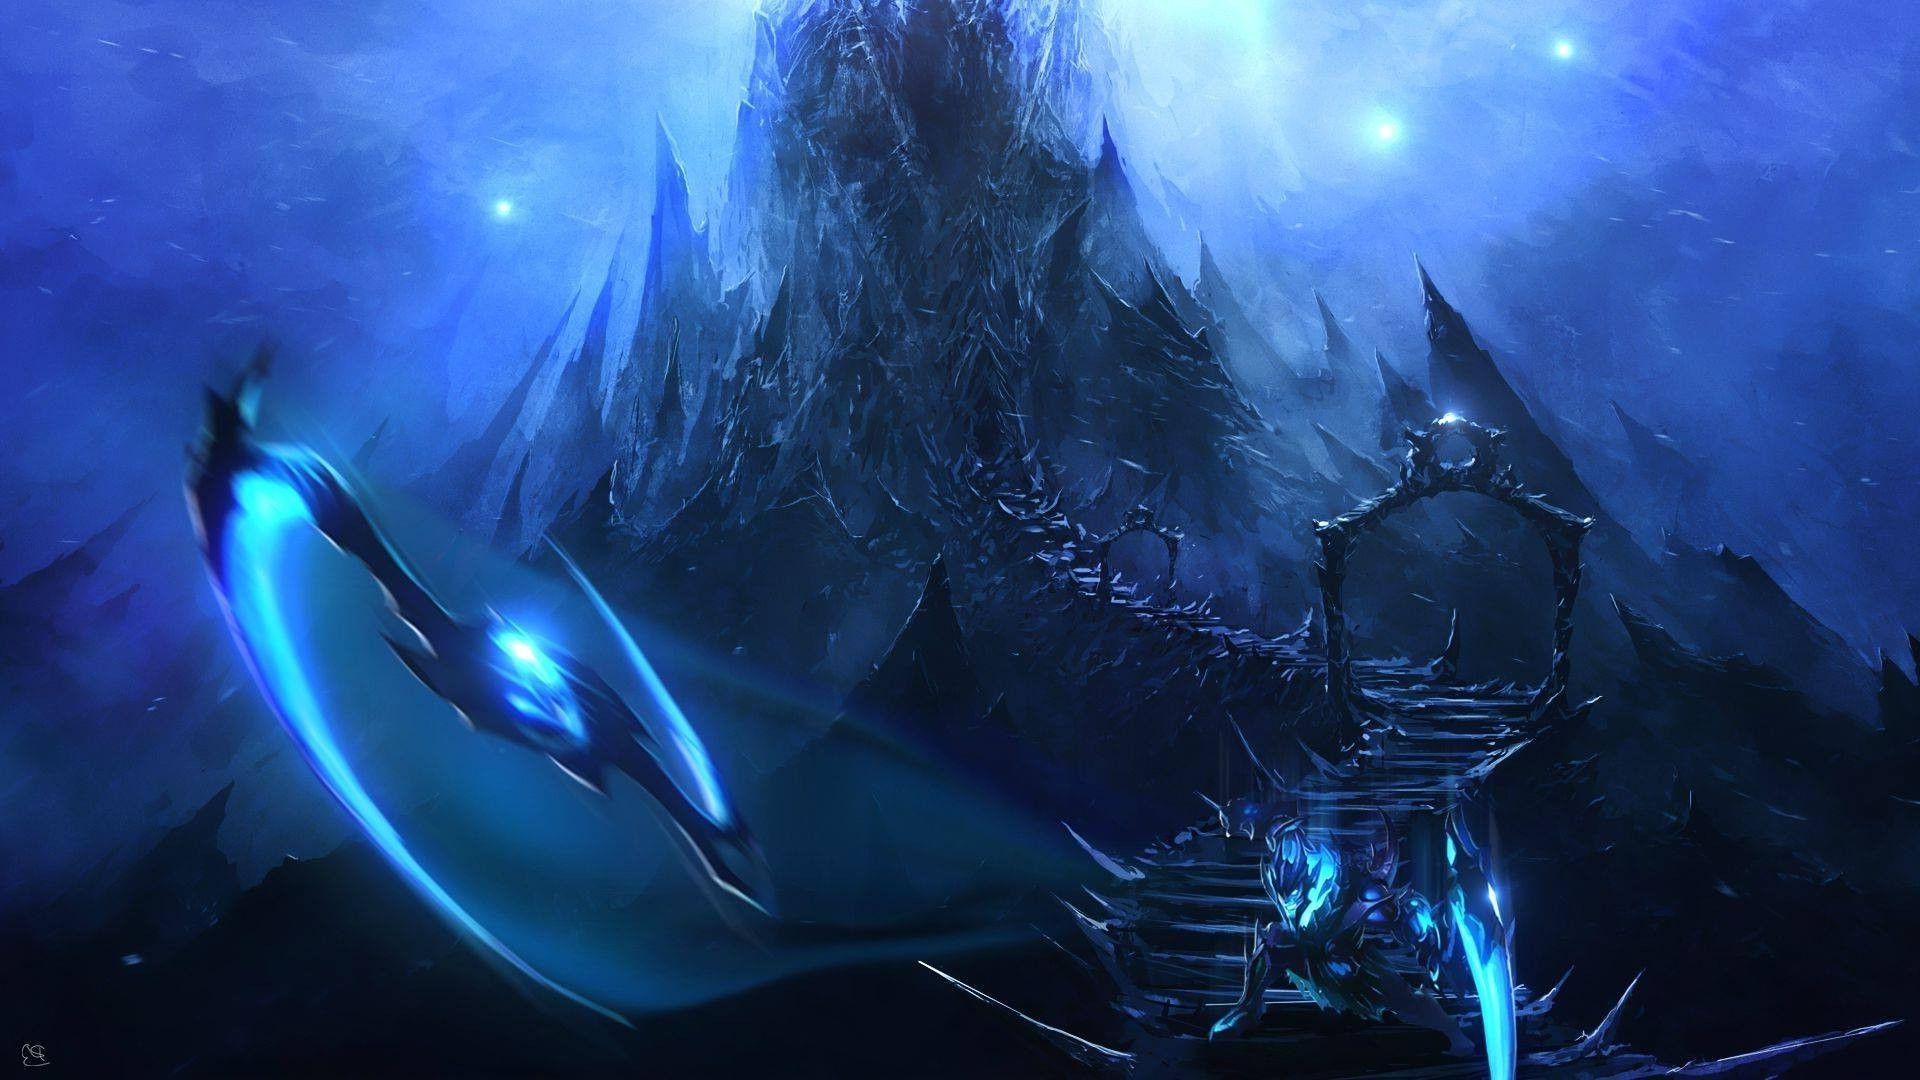 League Of Legends Draven Wallpaper Images : Game Wallpaper ...